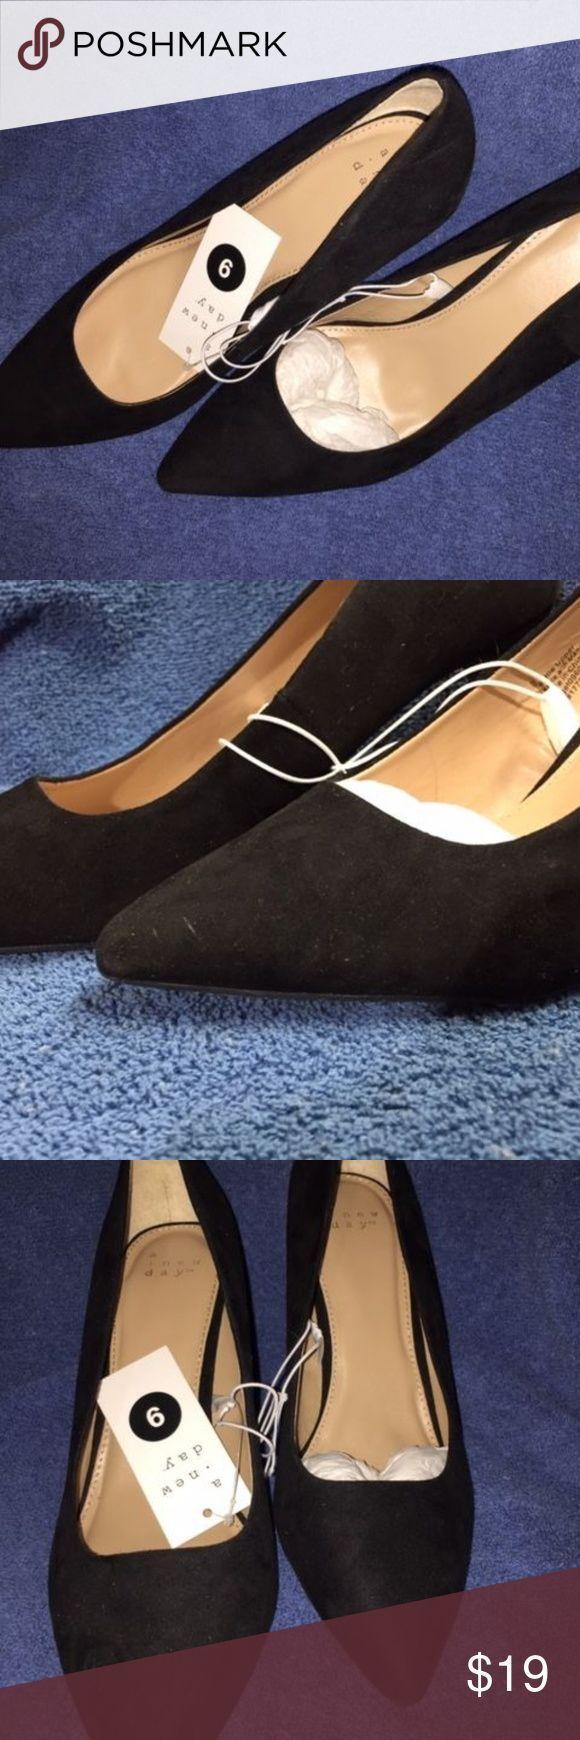 A New Day Black Heels Größe 9 Neu mit Tags A New Day Black Heels. Neu. Mit ta …